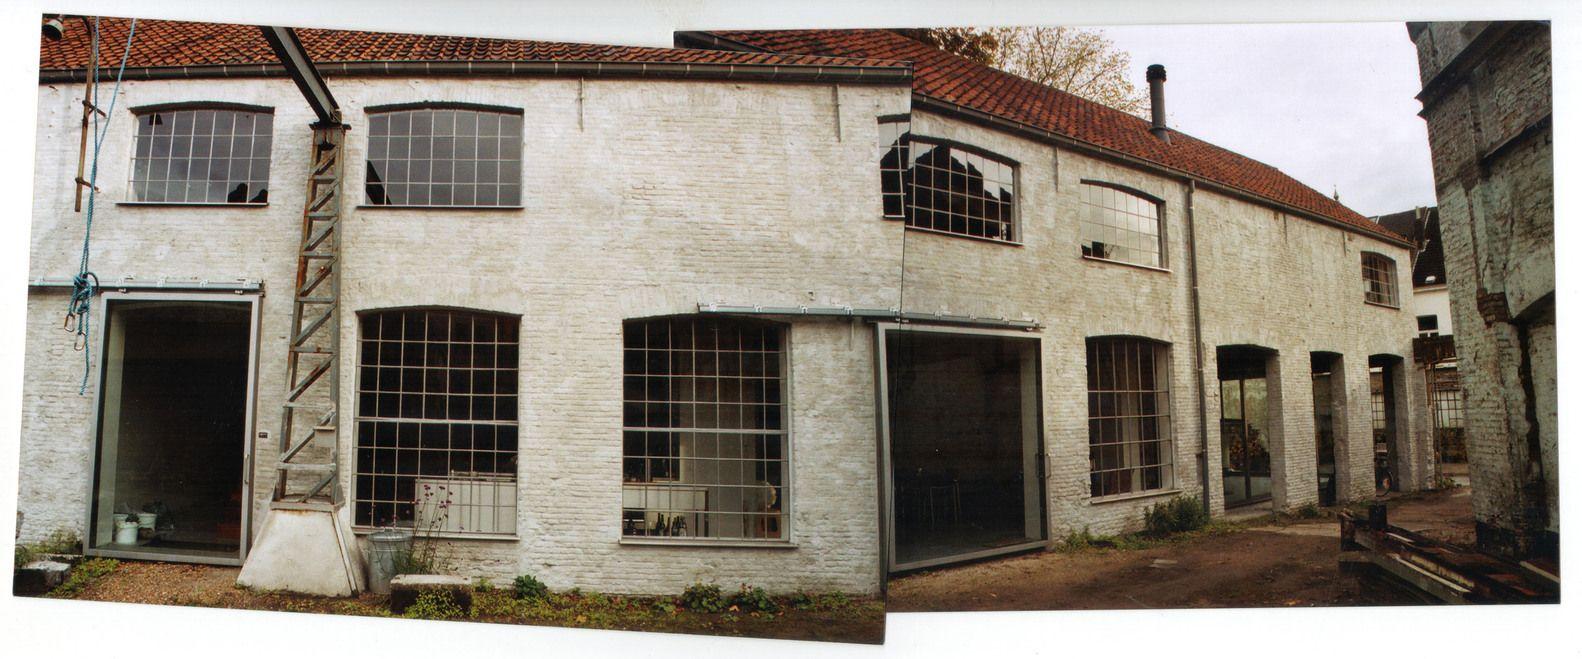 Gallery of Reconversion in Ghent / Axel Devroe - 15